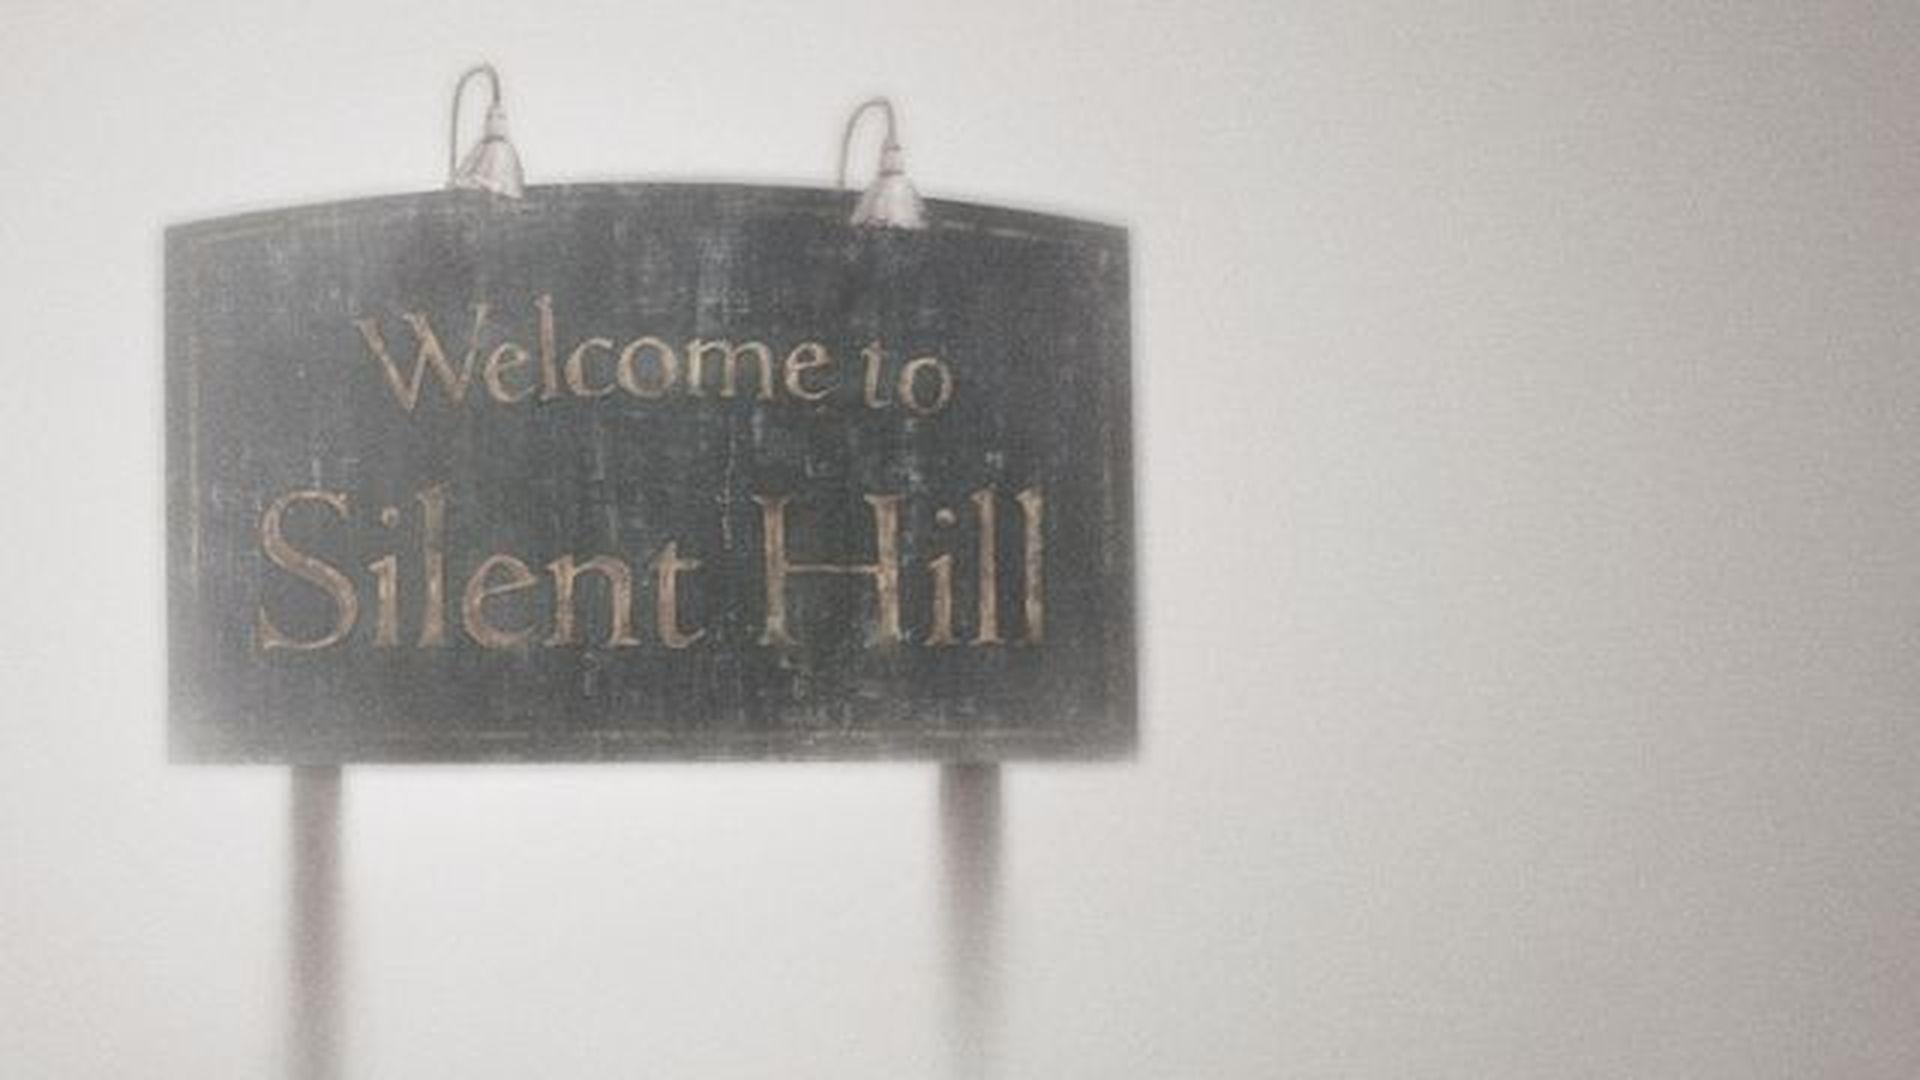 f39d0d87 dc9e 4705 86ce 62fbea287235 Silent Hill - Silent Hill : Porque a série é tão aclamada?